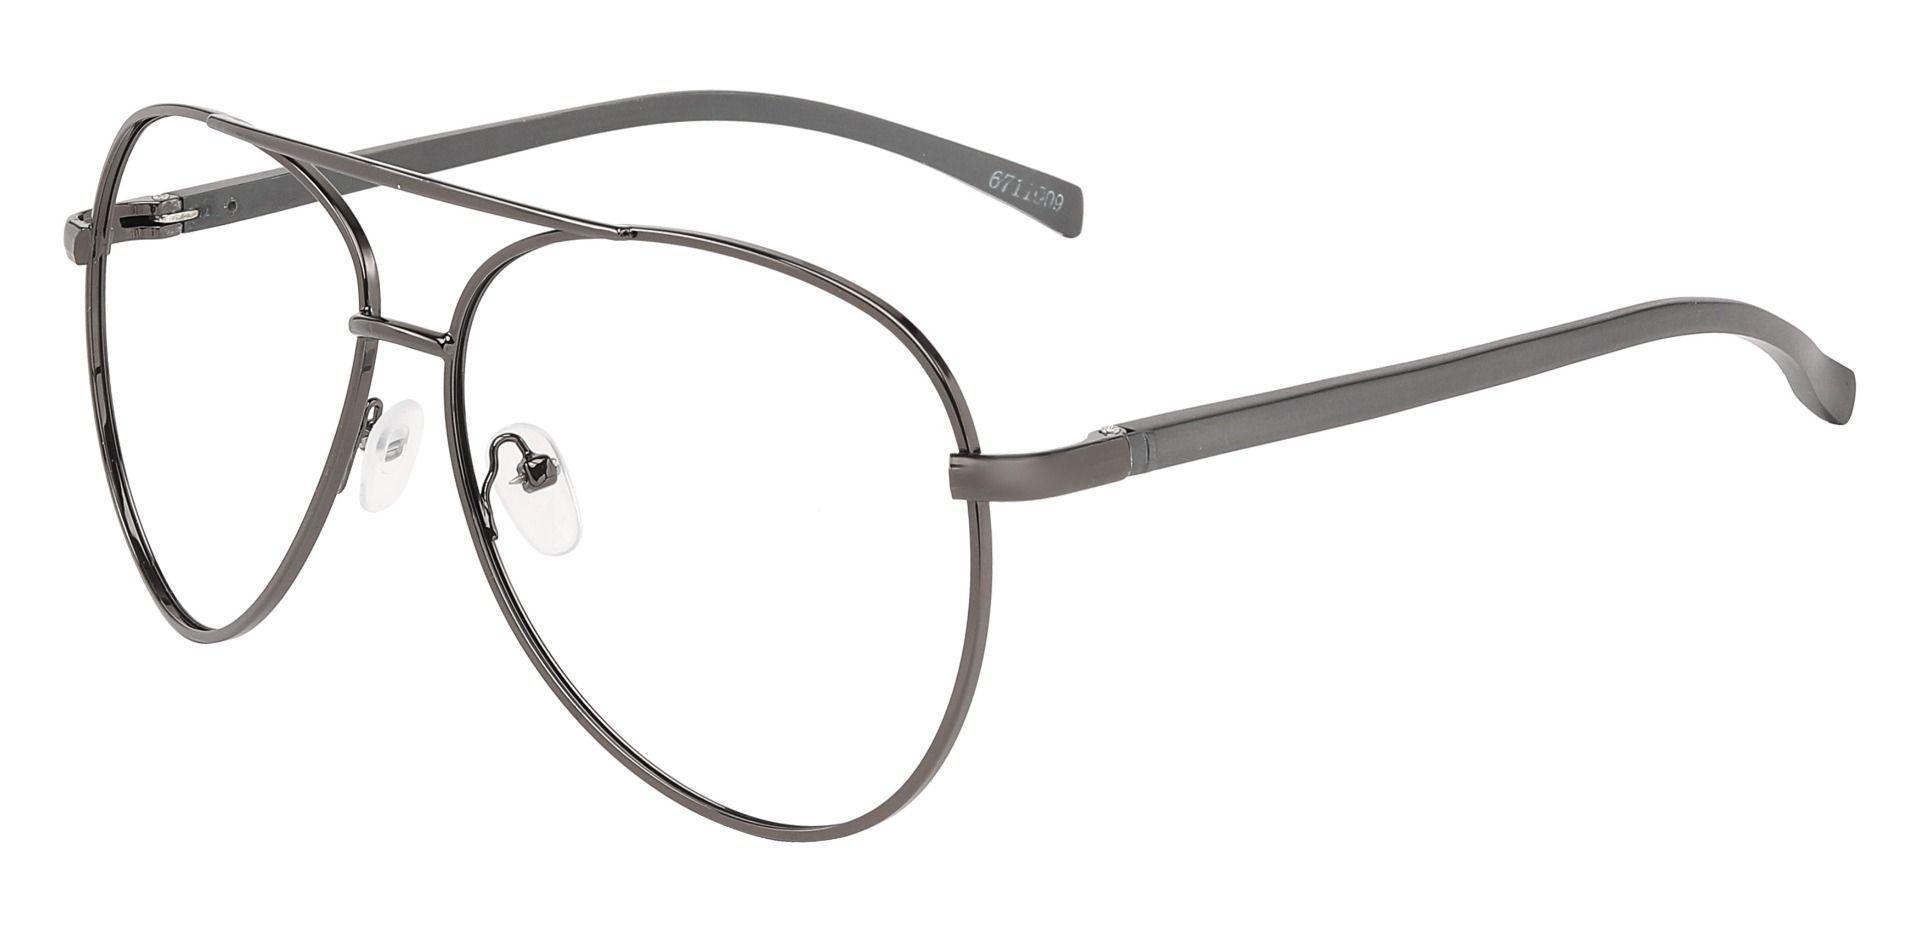 Marius Aviator Single Vision Glasses - Gray